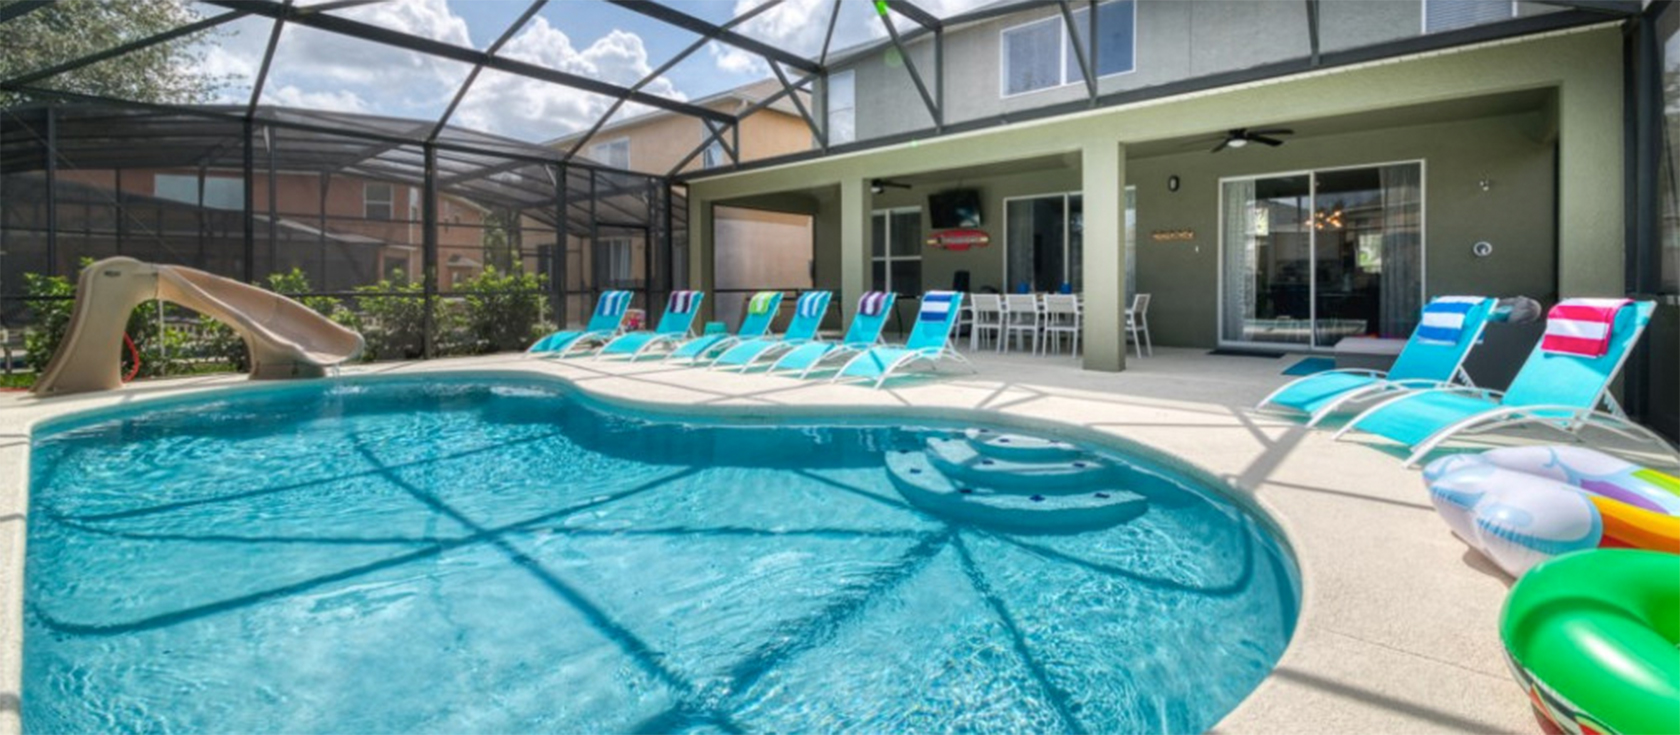 Emerald Island Resort 18, Kissimmee